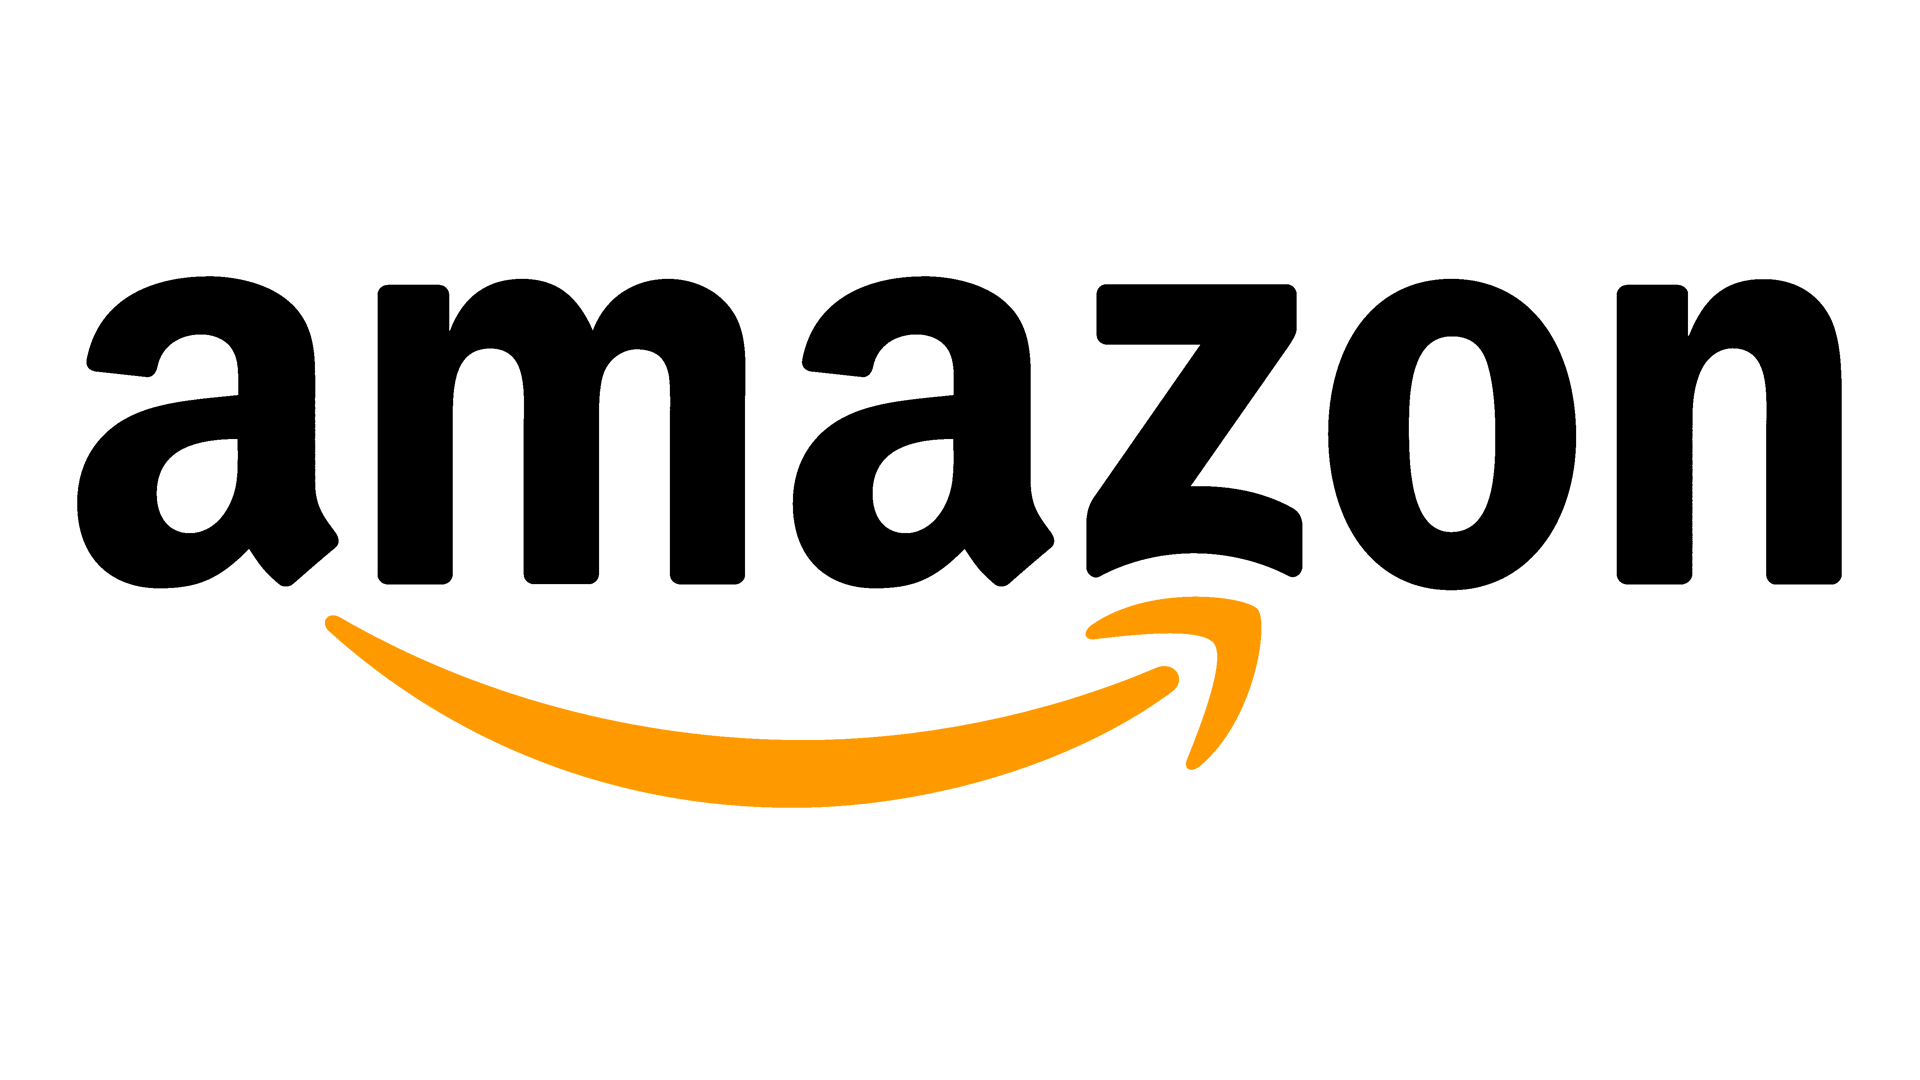 логотип амазон